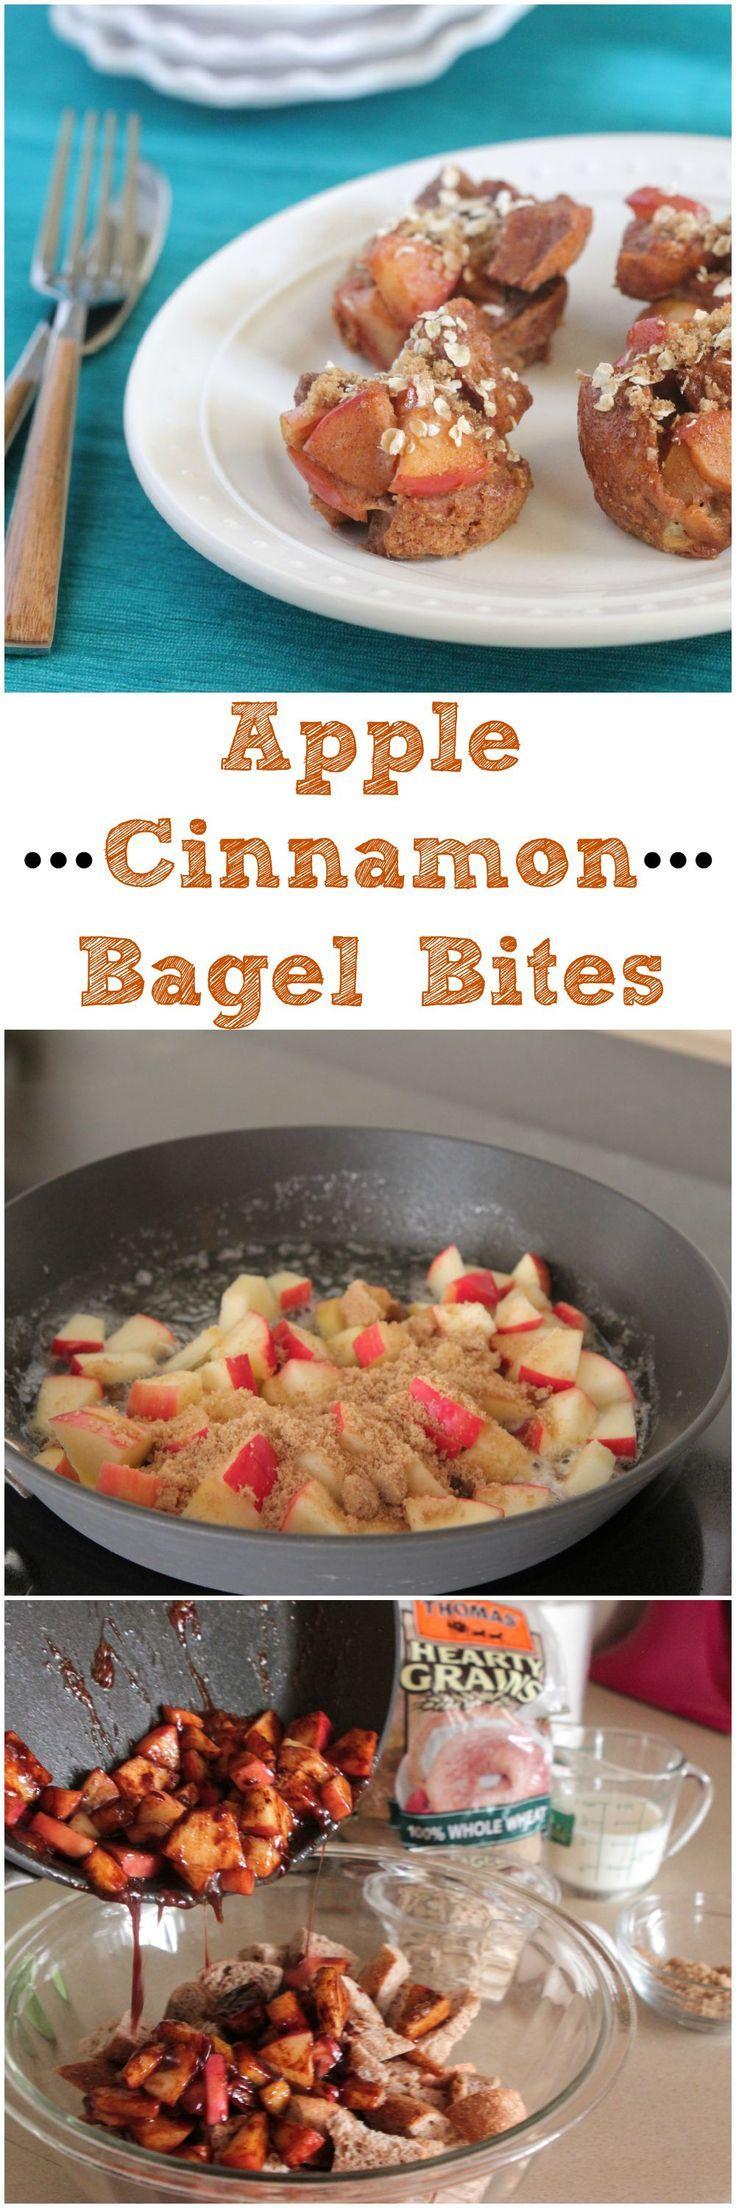 Apple Cinnamon Bagel Bites #breakfast #snack #recipe